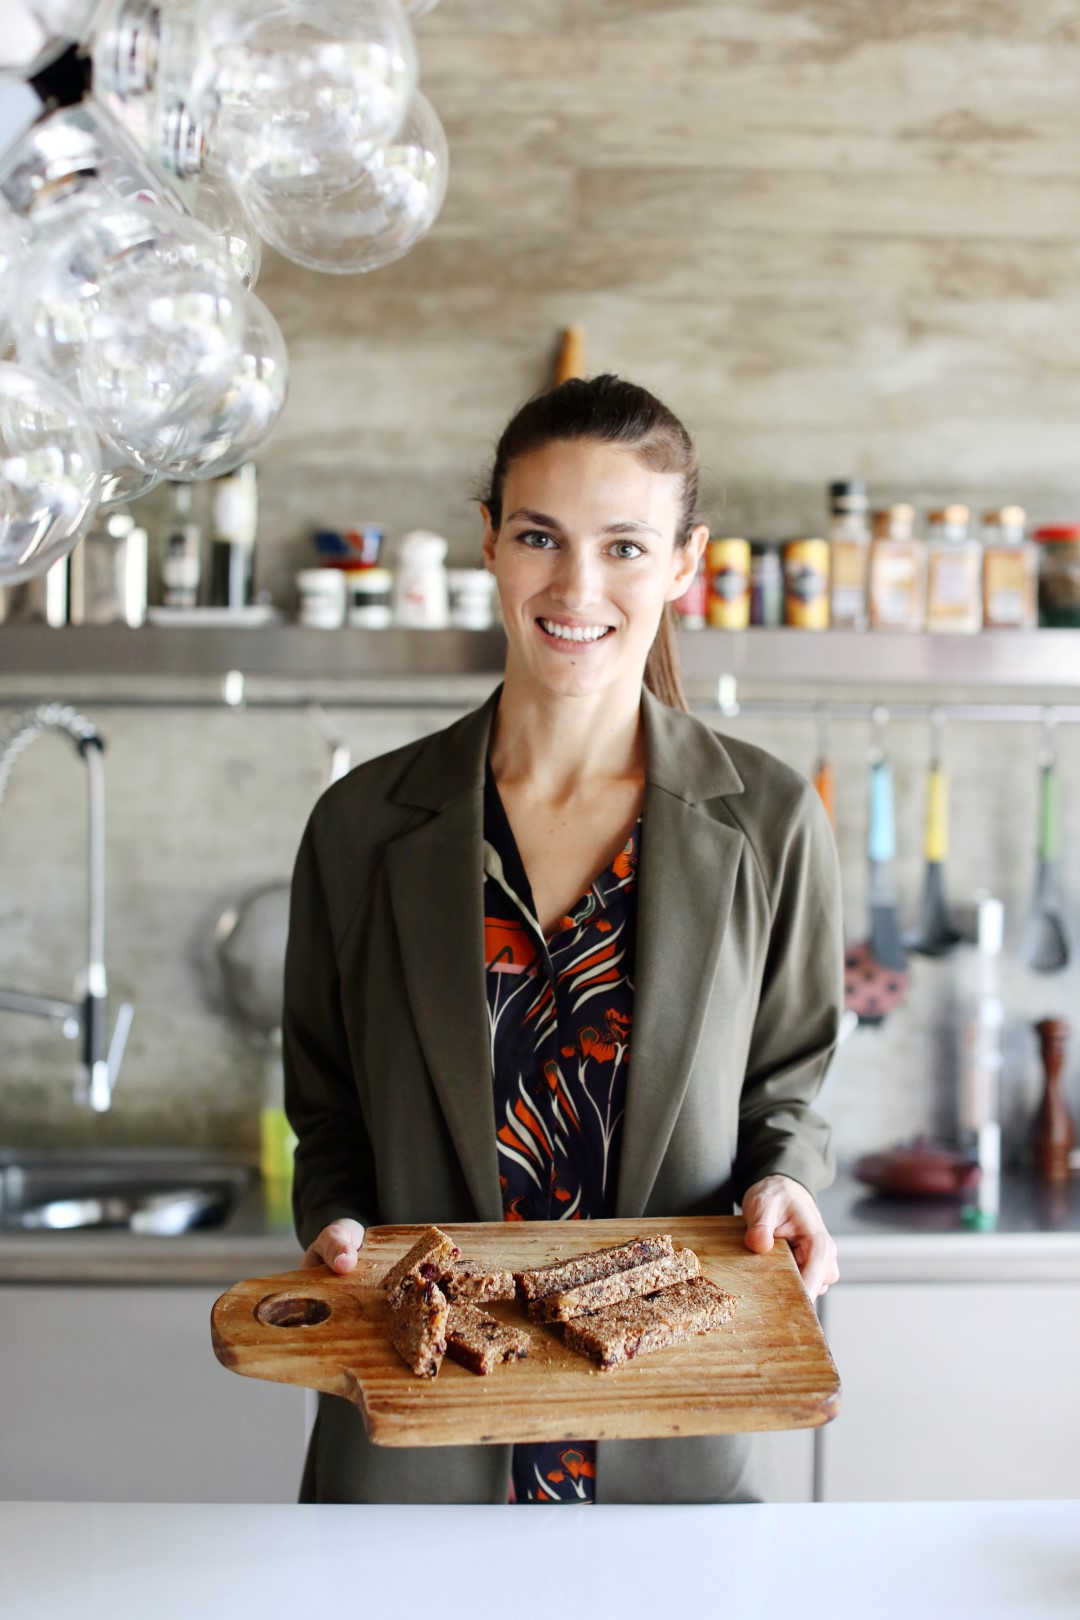 steffi rauhut, cocinera, autora del blog Not Only Salad Blog,